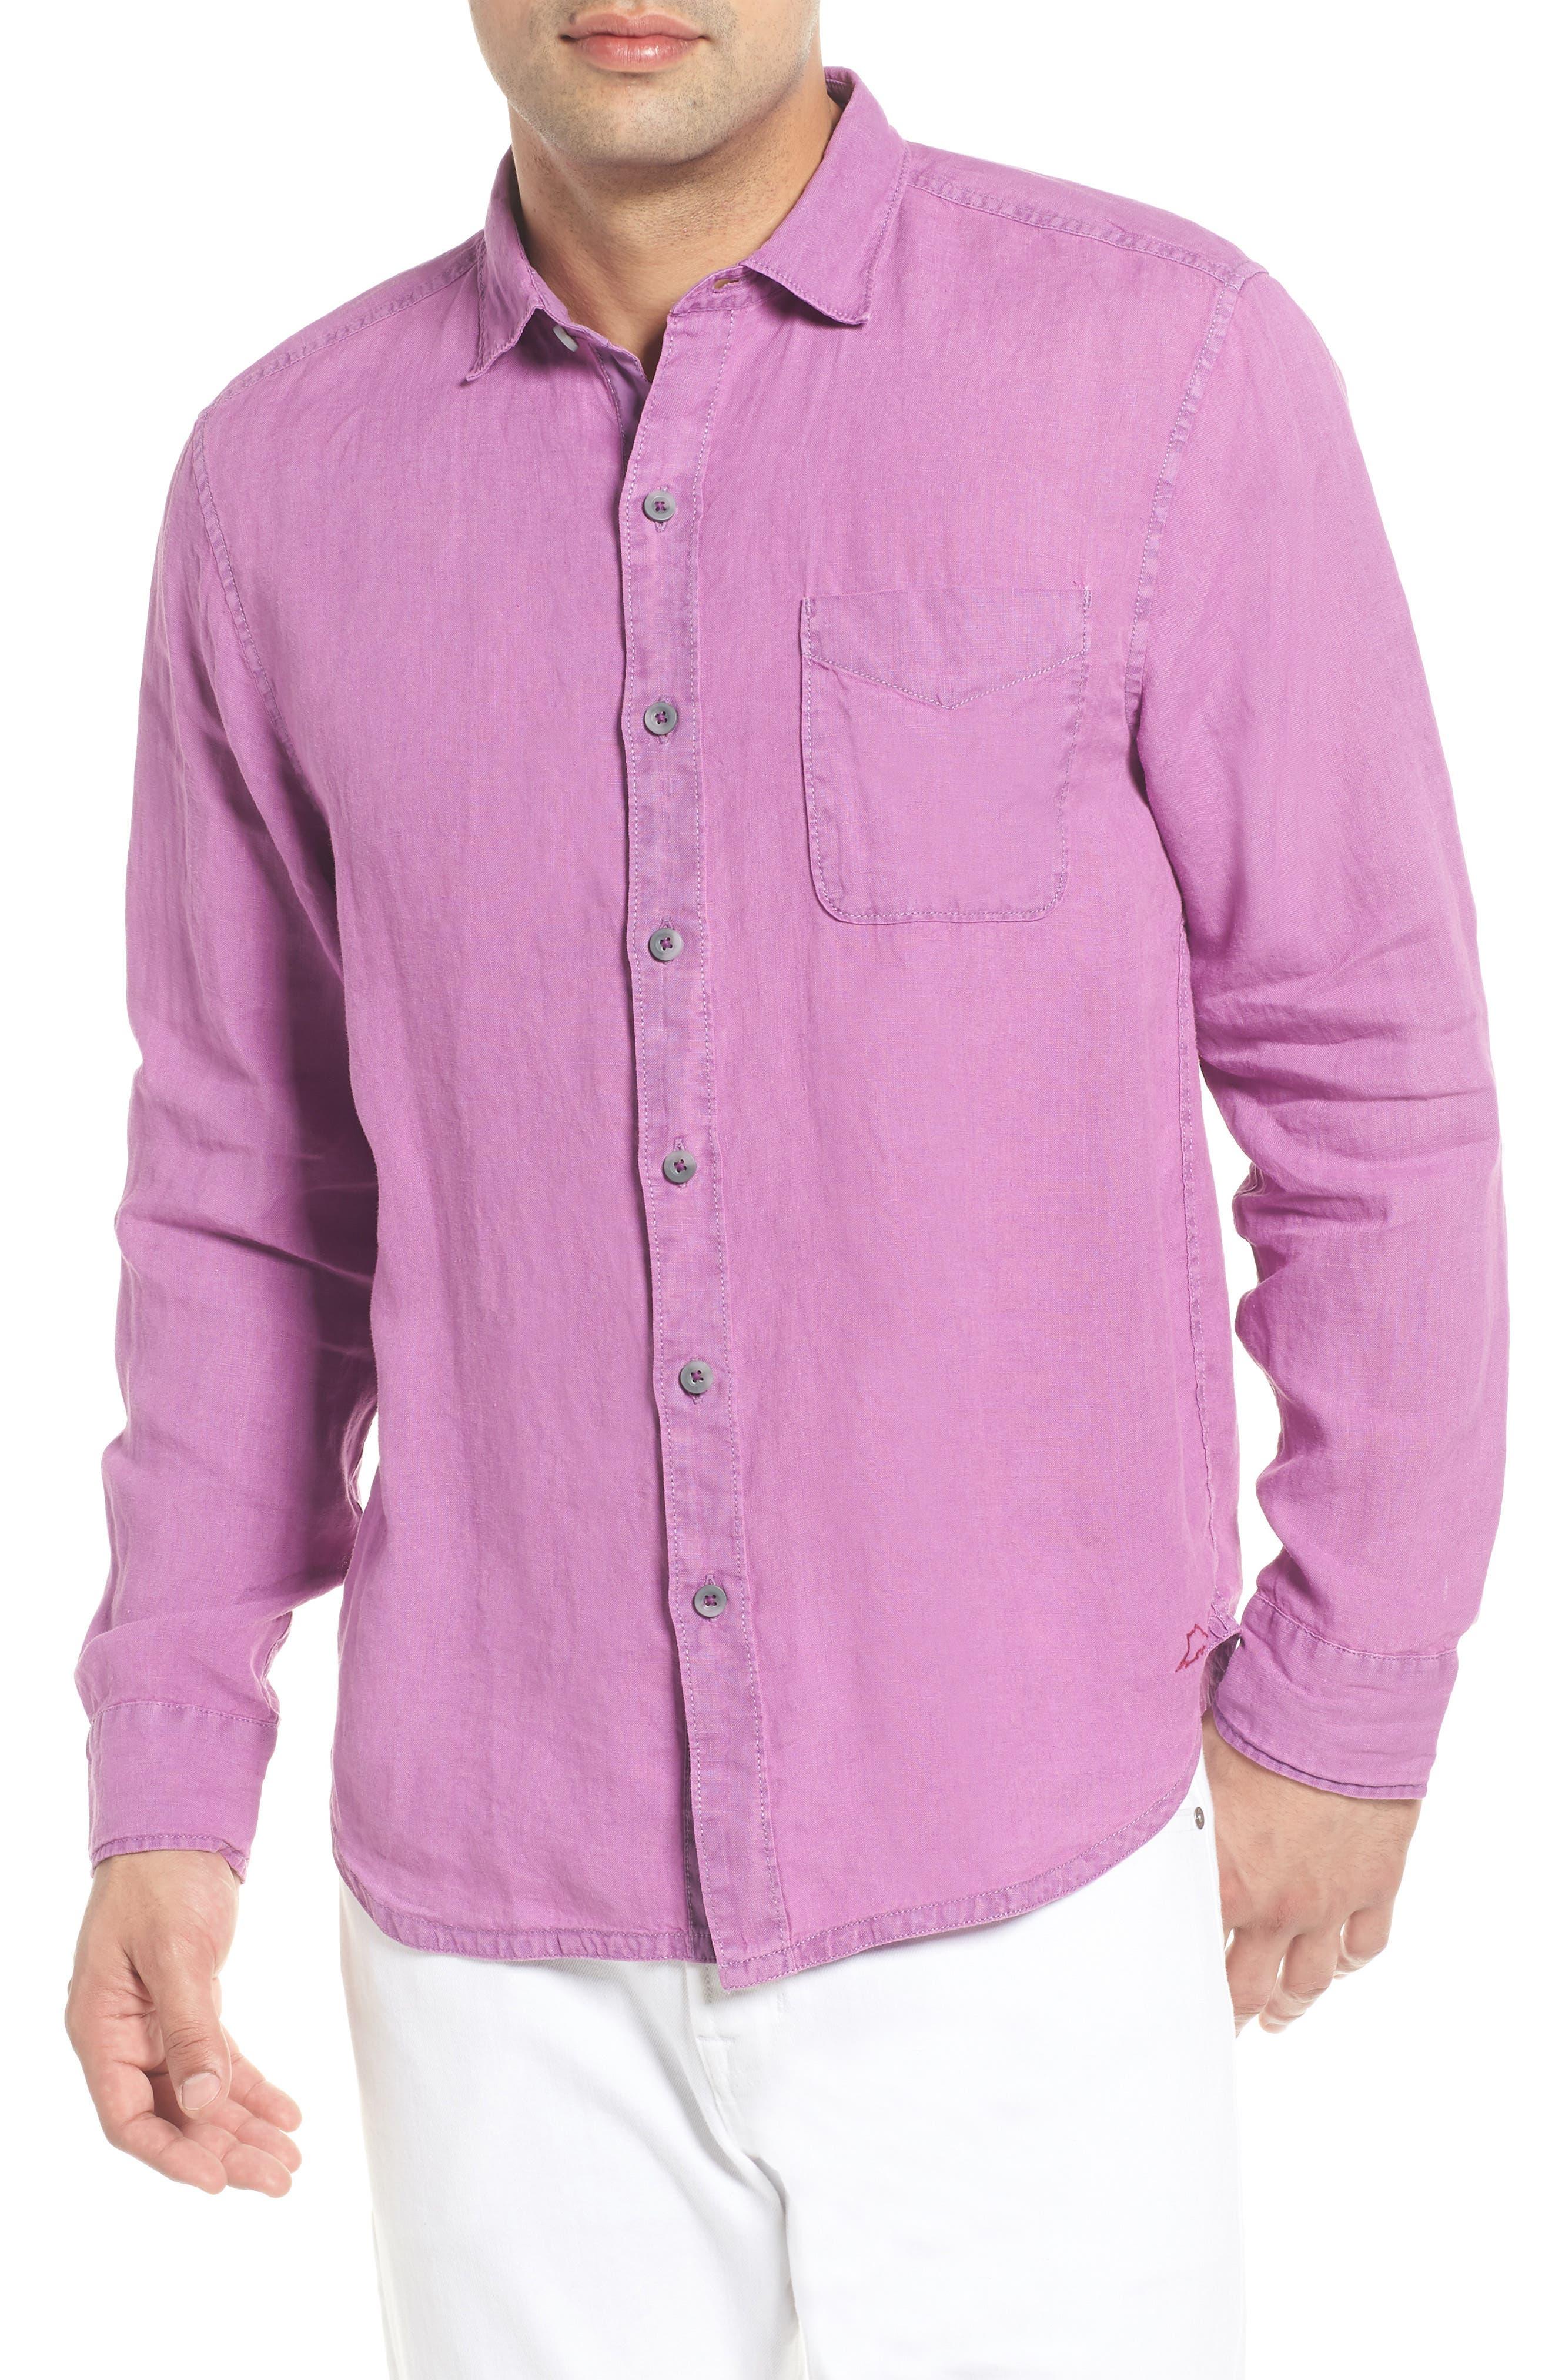 Main Image - Tommy Bahama Seaspray Breezer Standard Fit Linen Sport Shirt